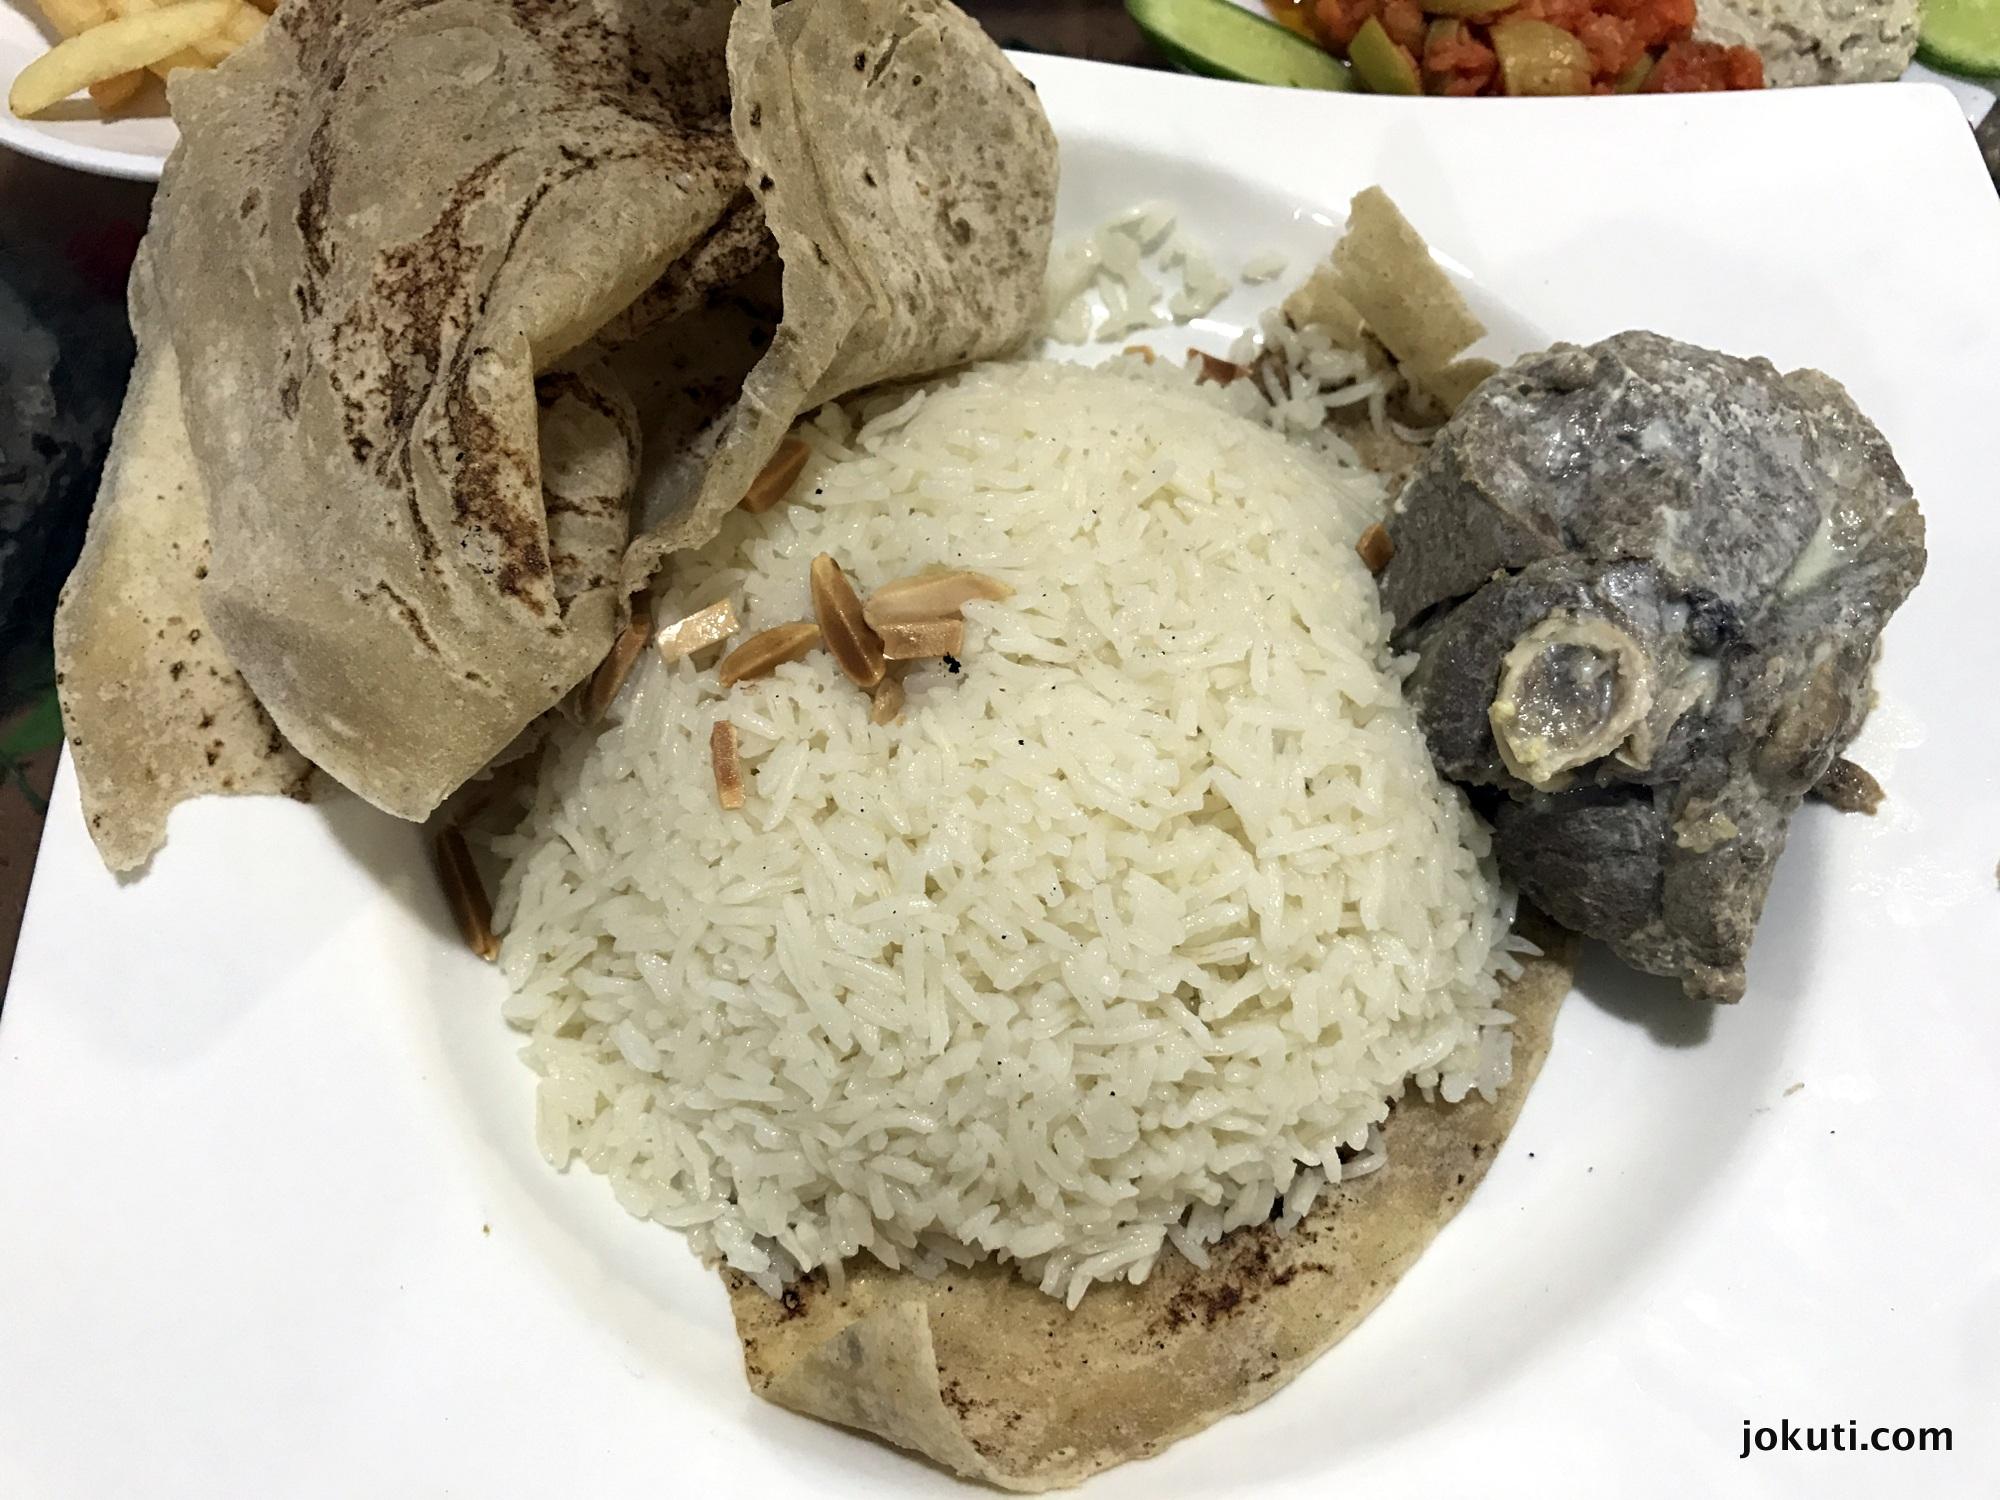 jordan_middleeast_kozelkelet_jokuti_vilagevo_mezze_food_chickpea_6983.jpg